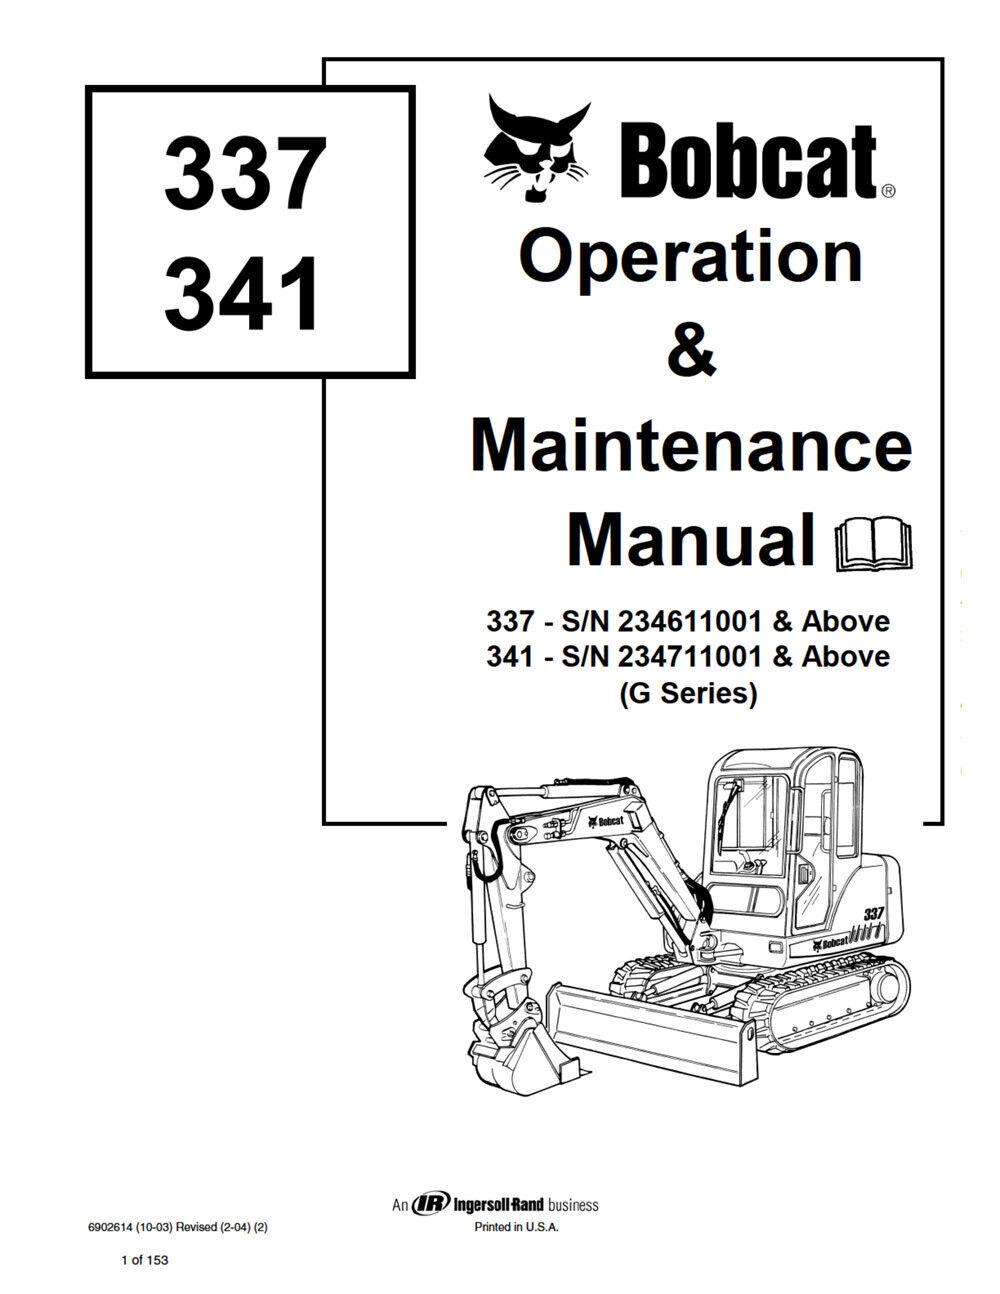 Bobcat 337 341 G-Series Excavator New 2009 Edition Repair